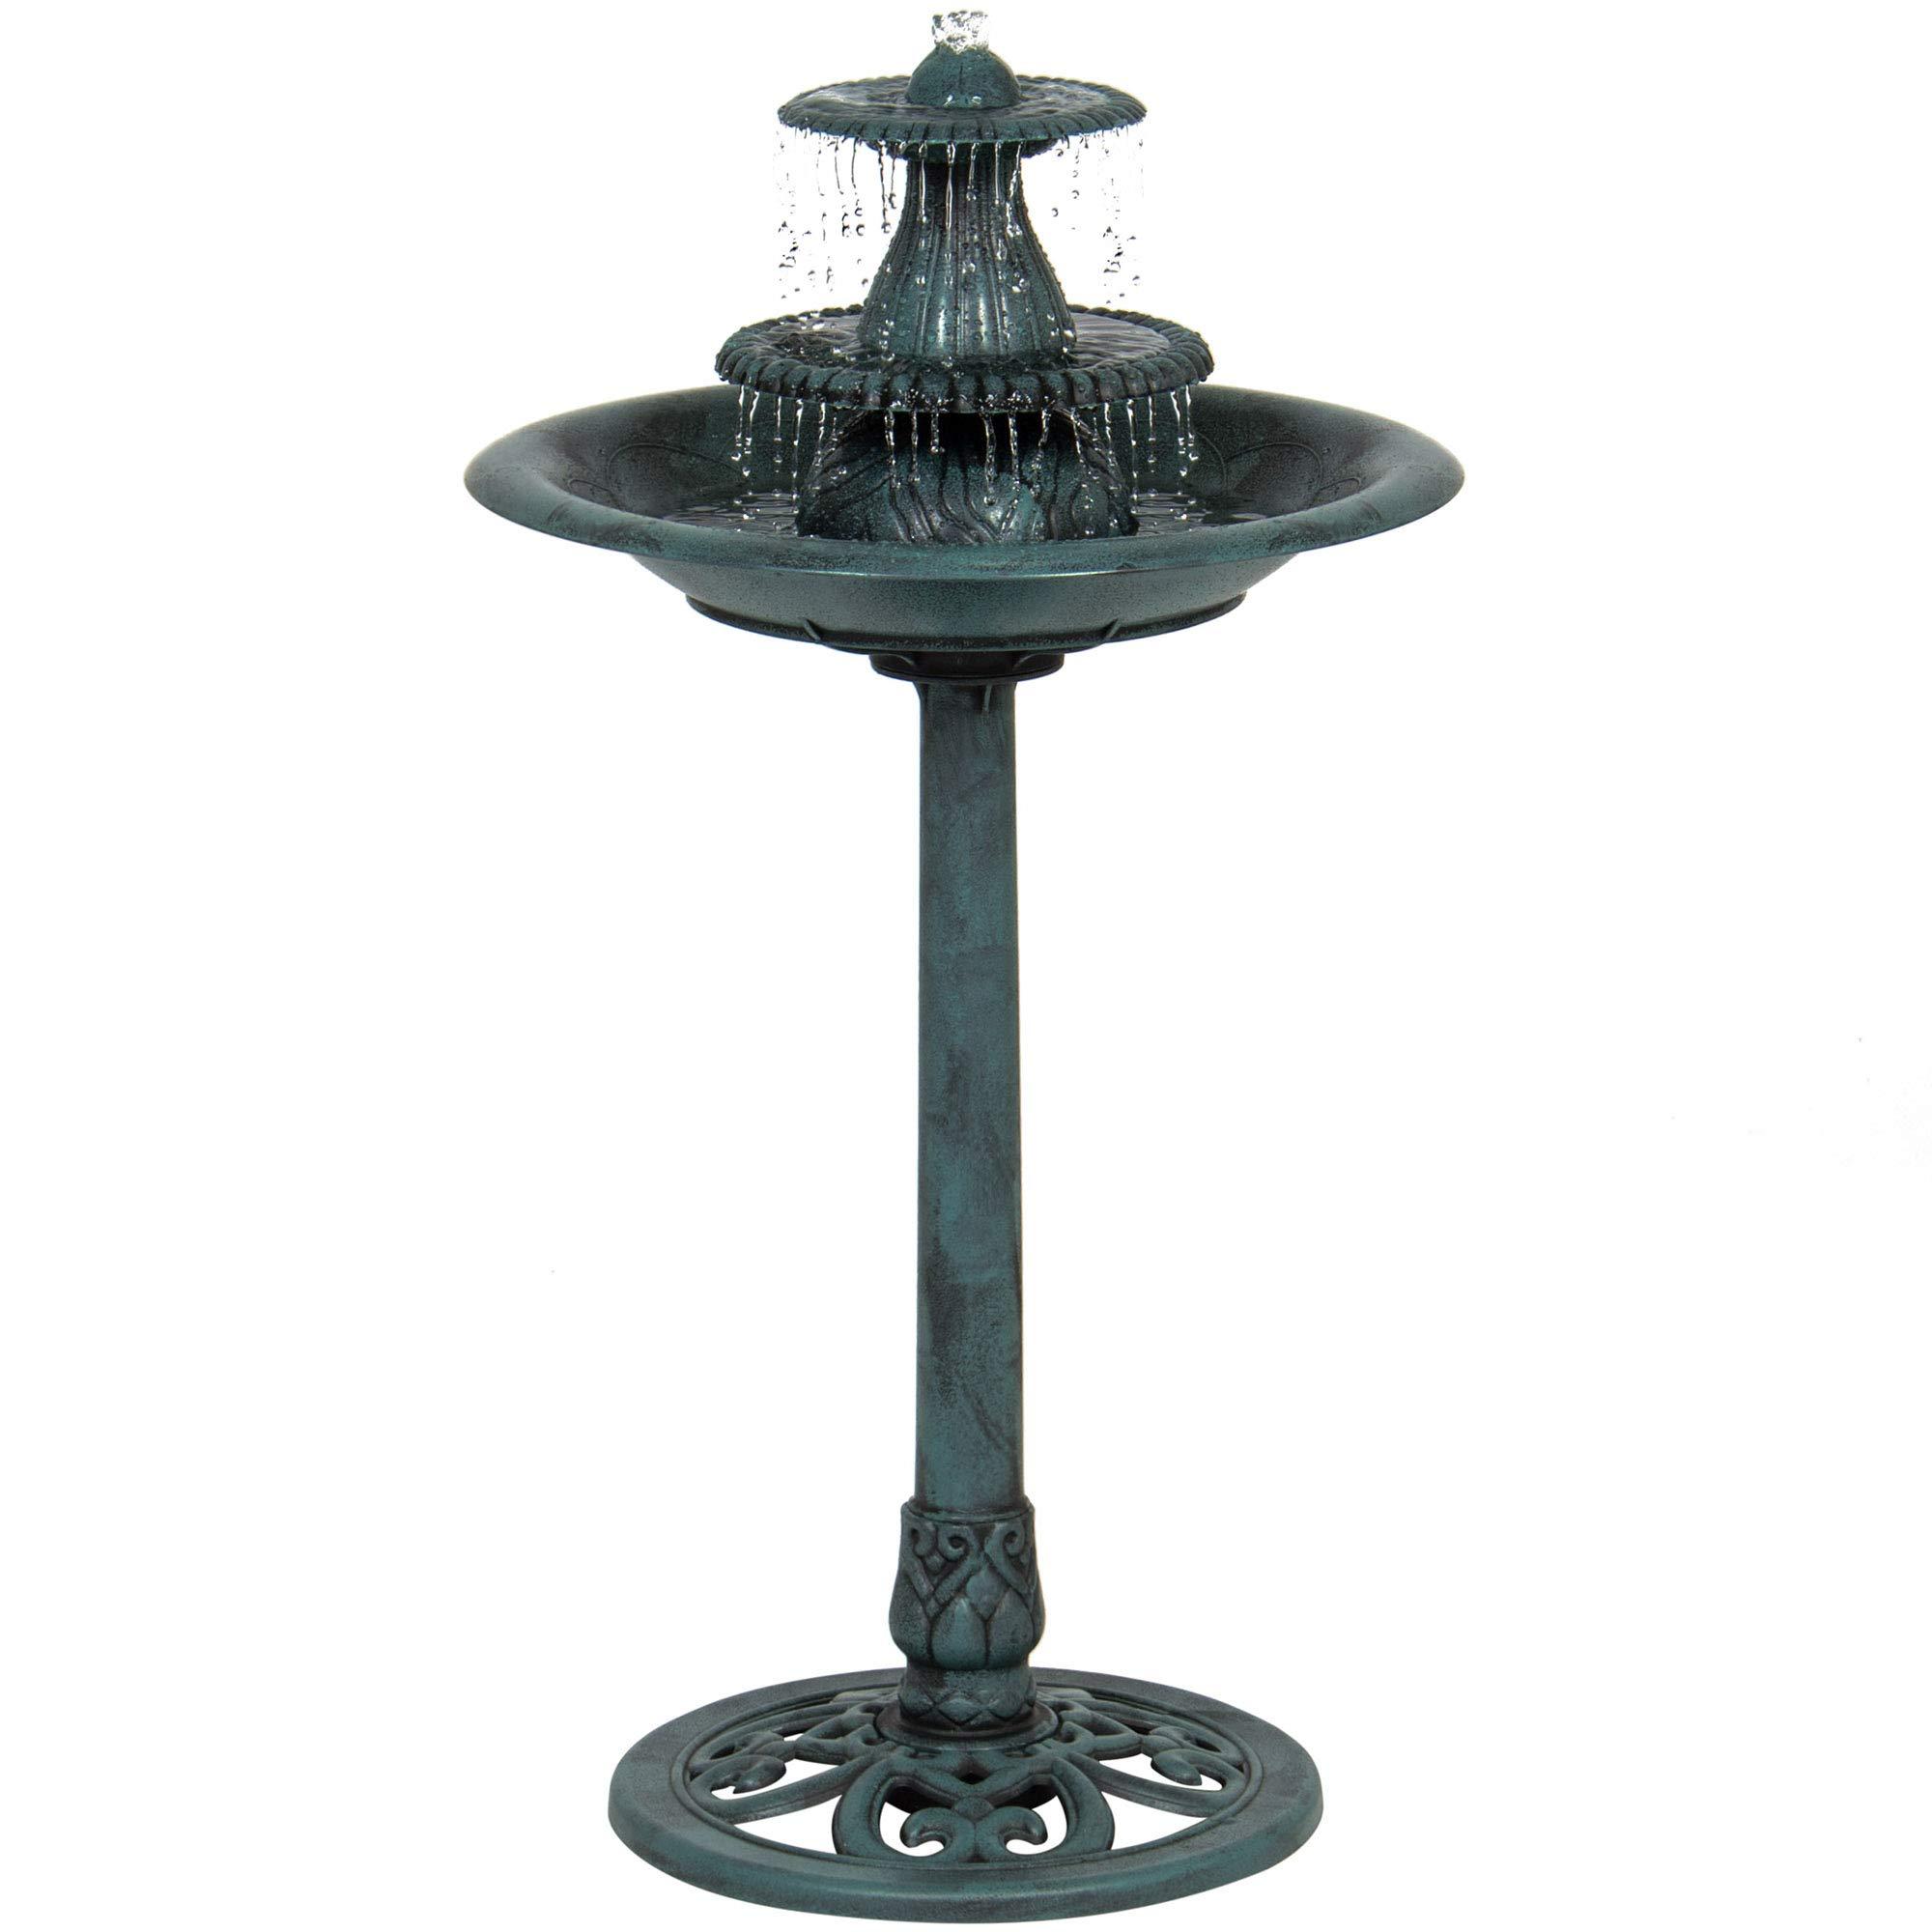 Best Choice Products 3-Tier Indoor/Outdoor Polyresin Pedestal Bird Bath Fountain Decor w/Pump - Green